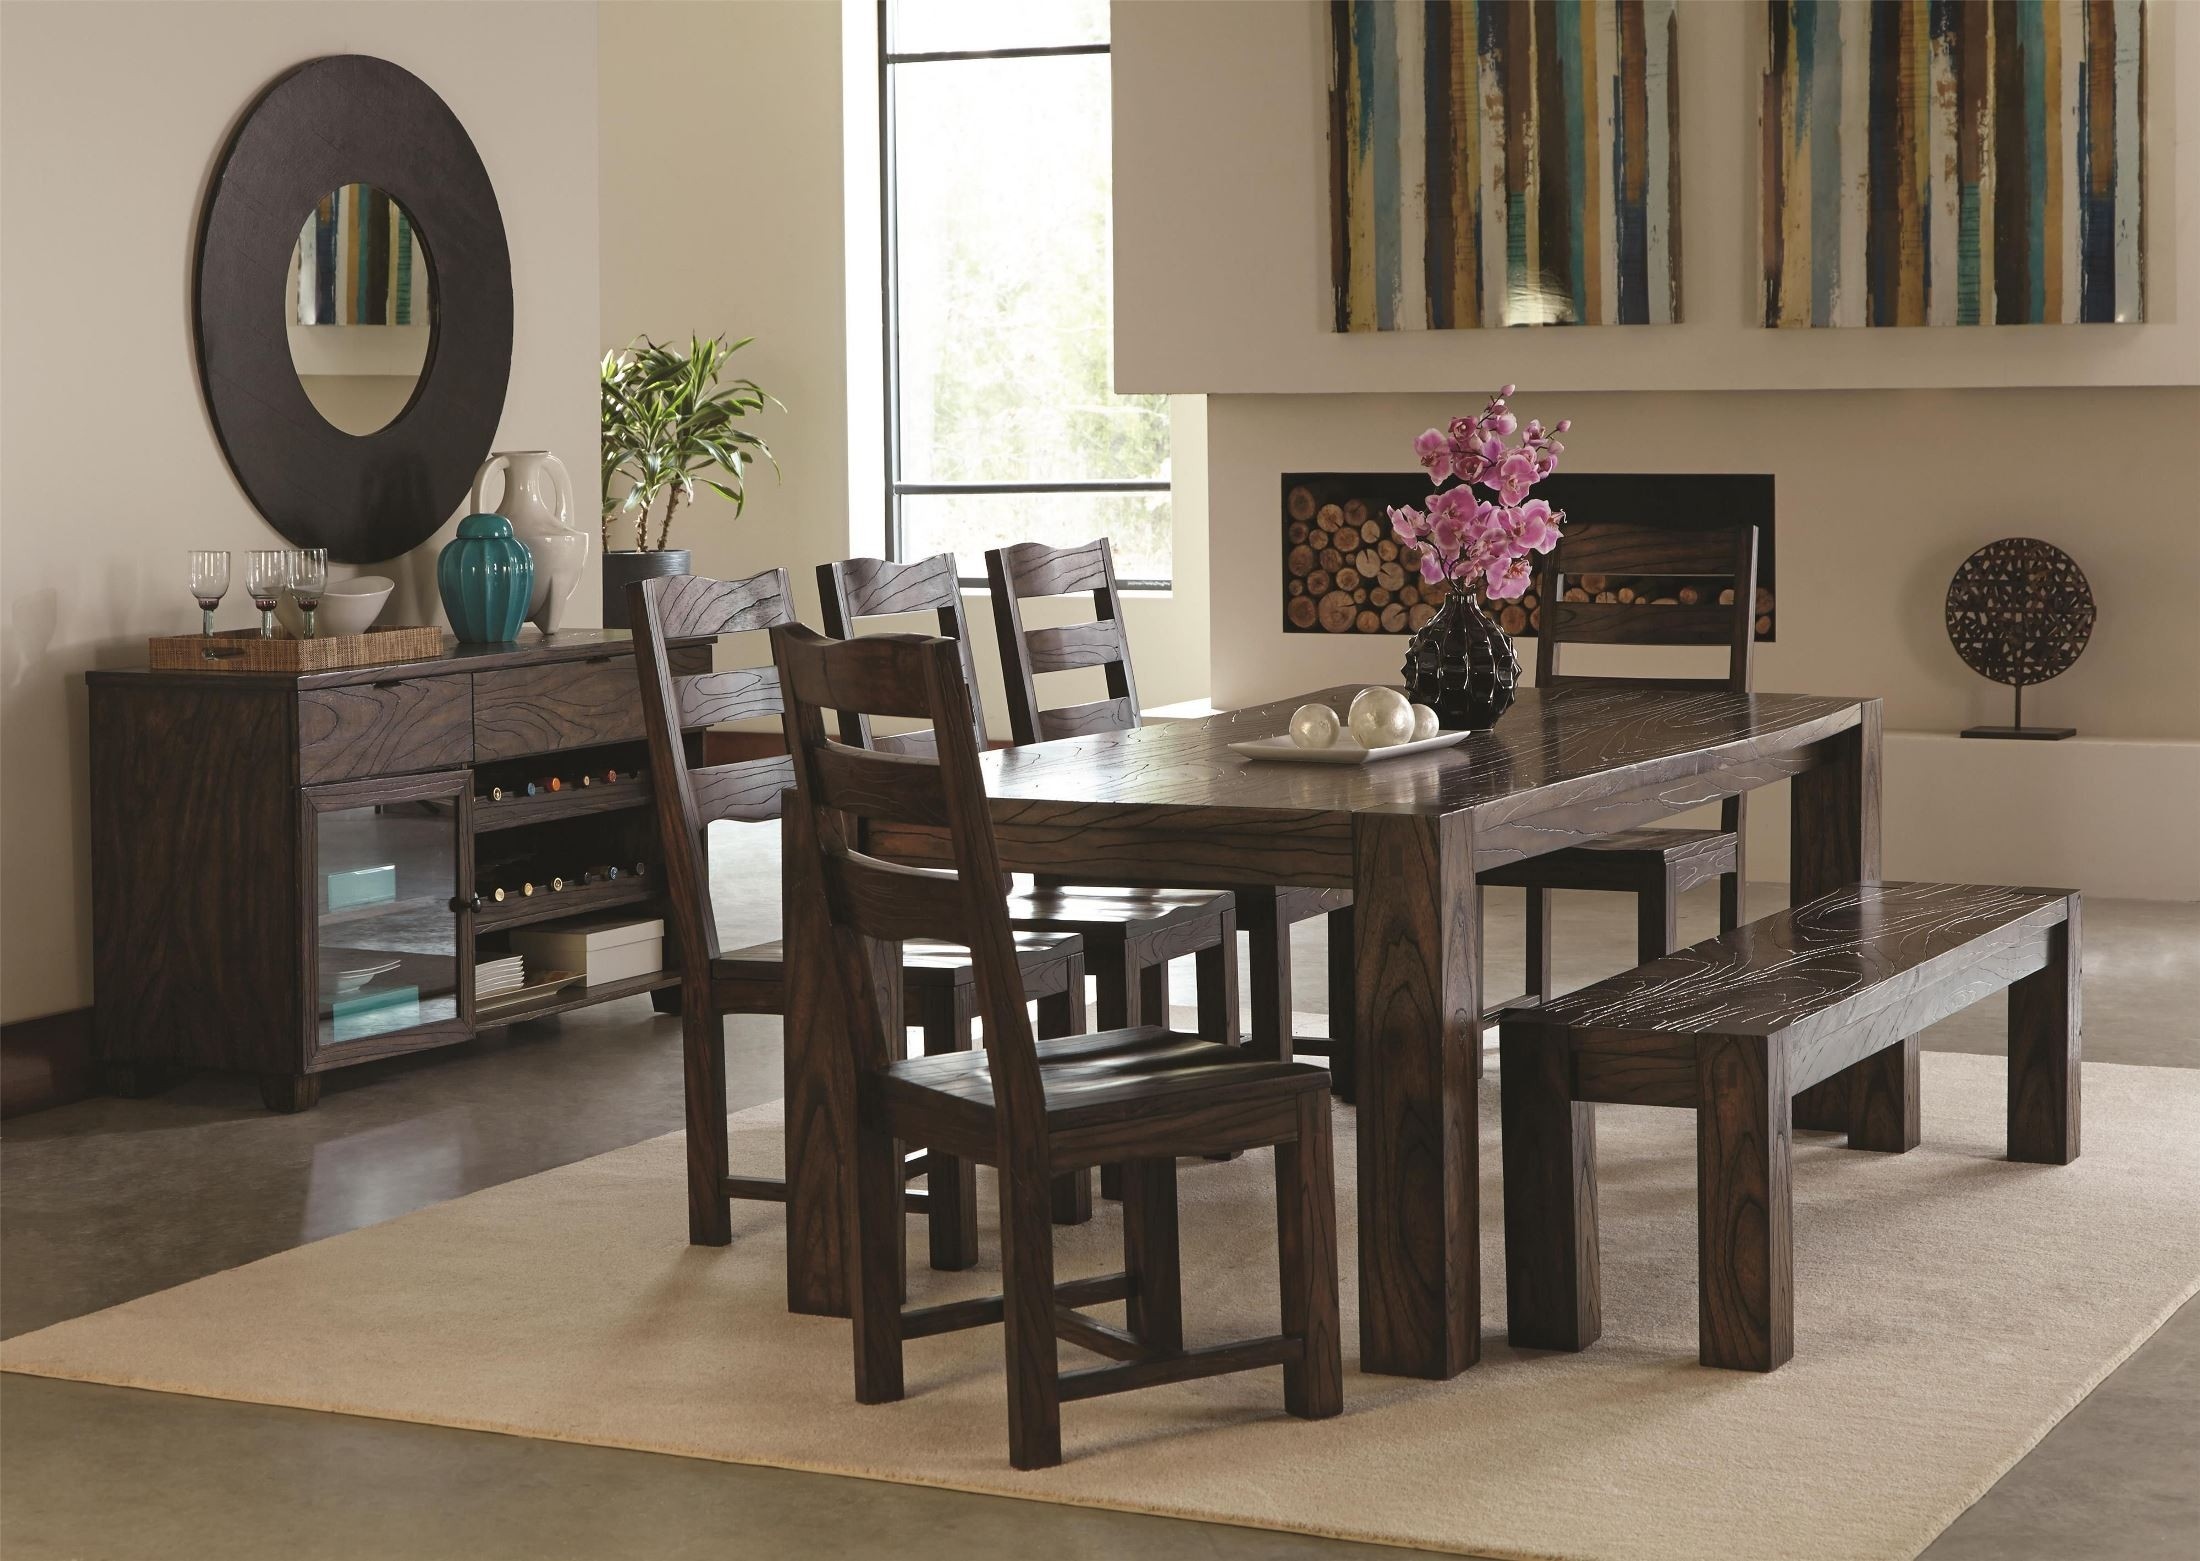 calabasas dark brown dining room set from coaster 121151 coleman furniture. Black Bedroom Furniture Sets. Home Design Ideas